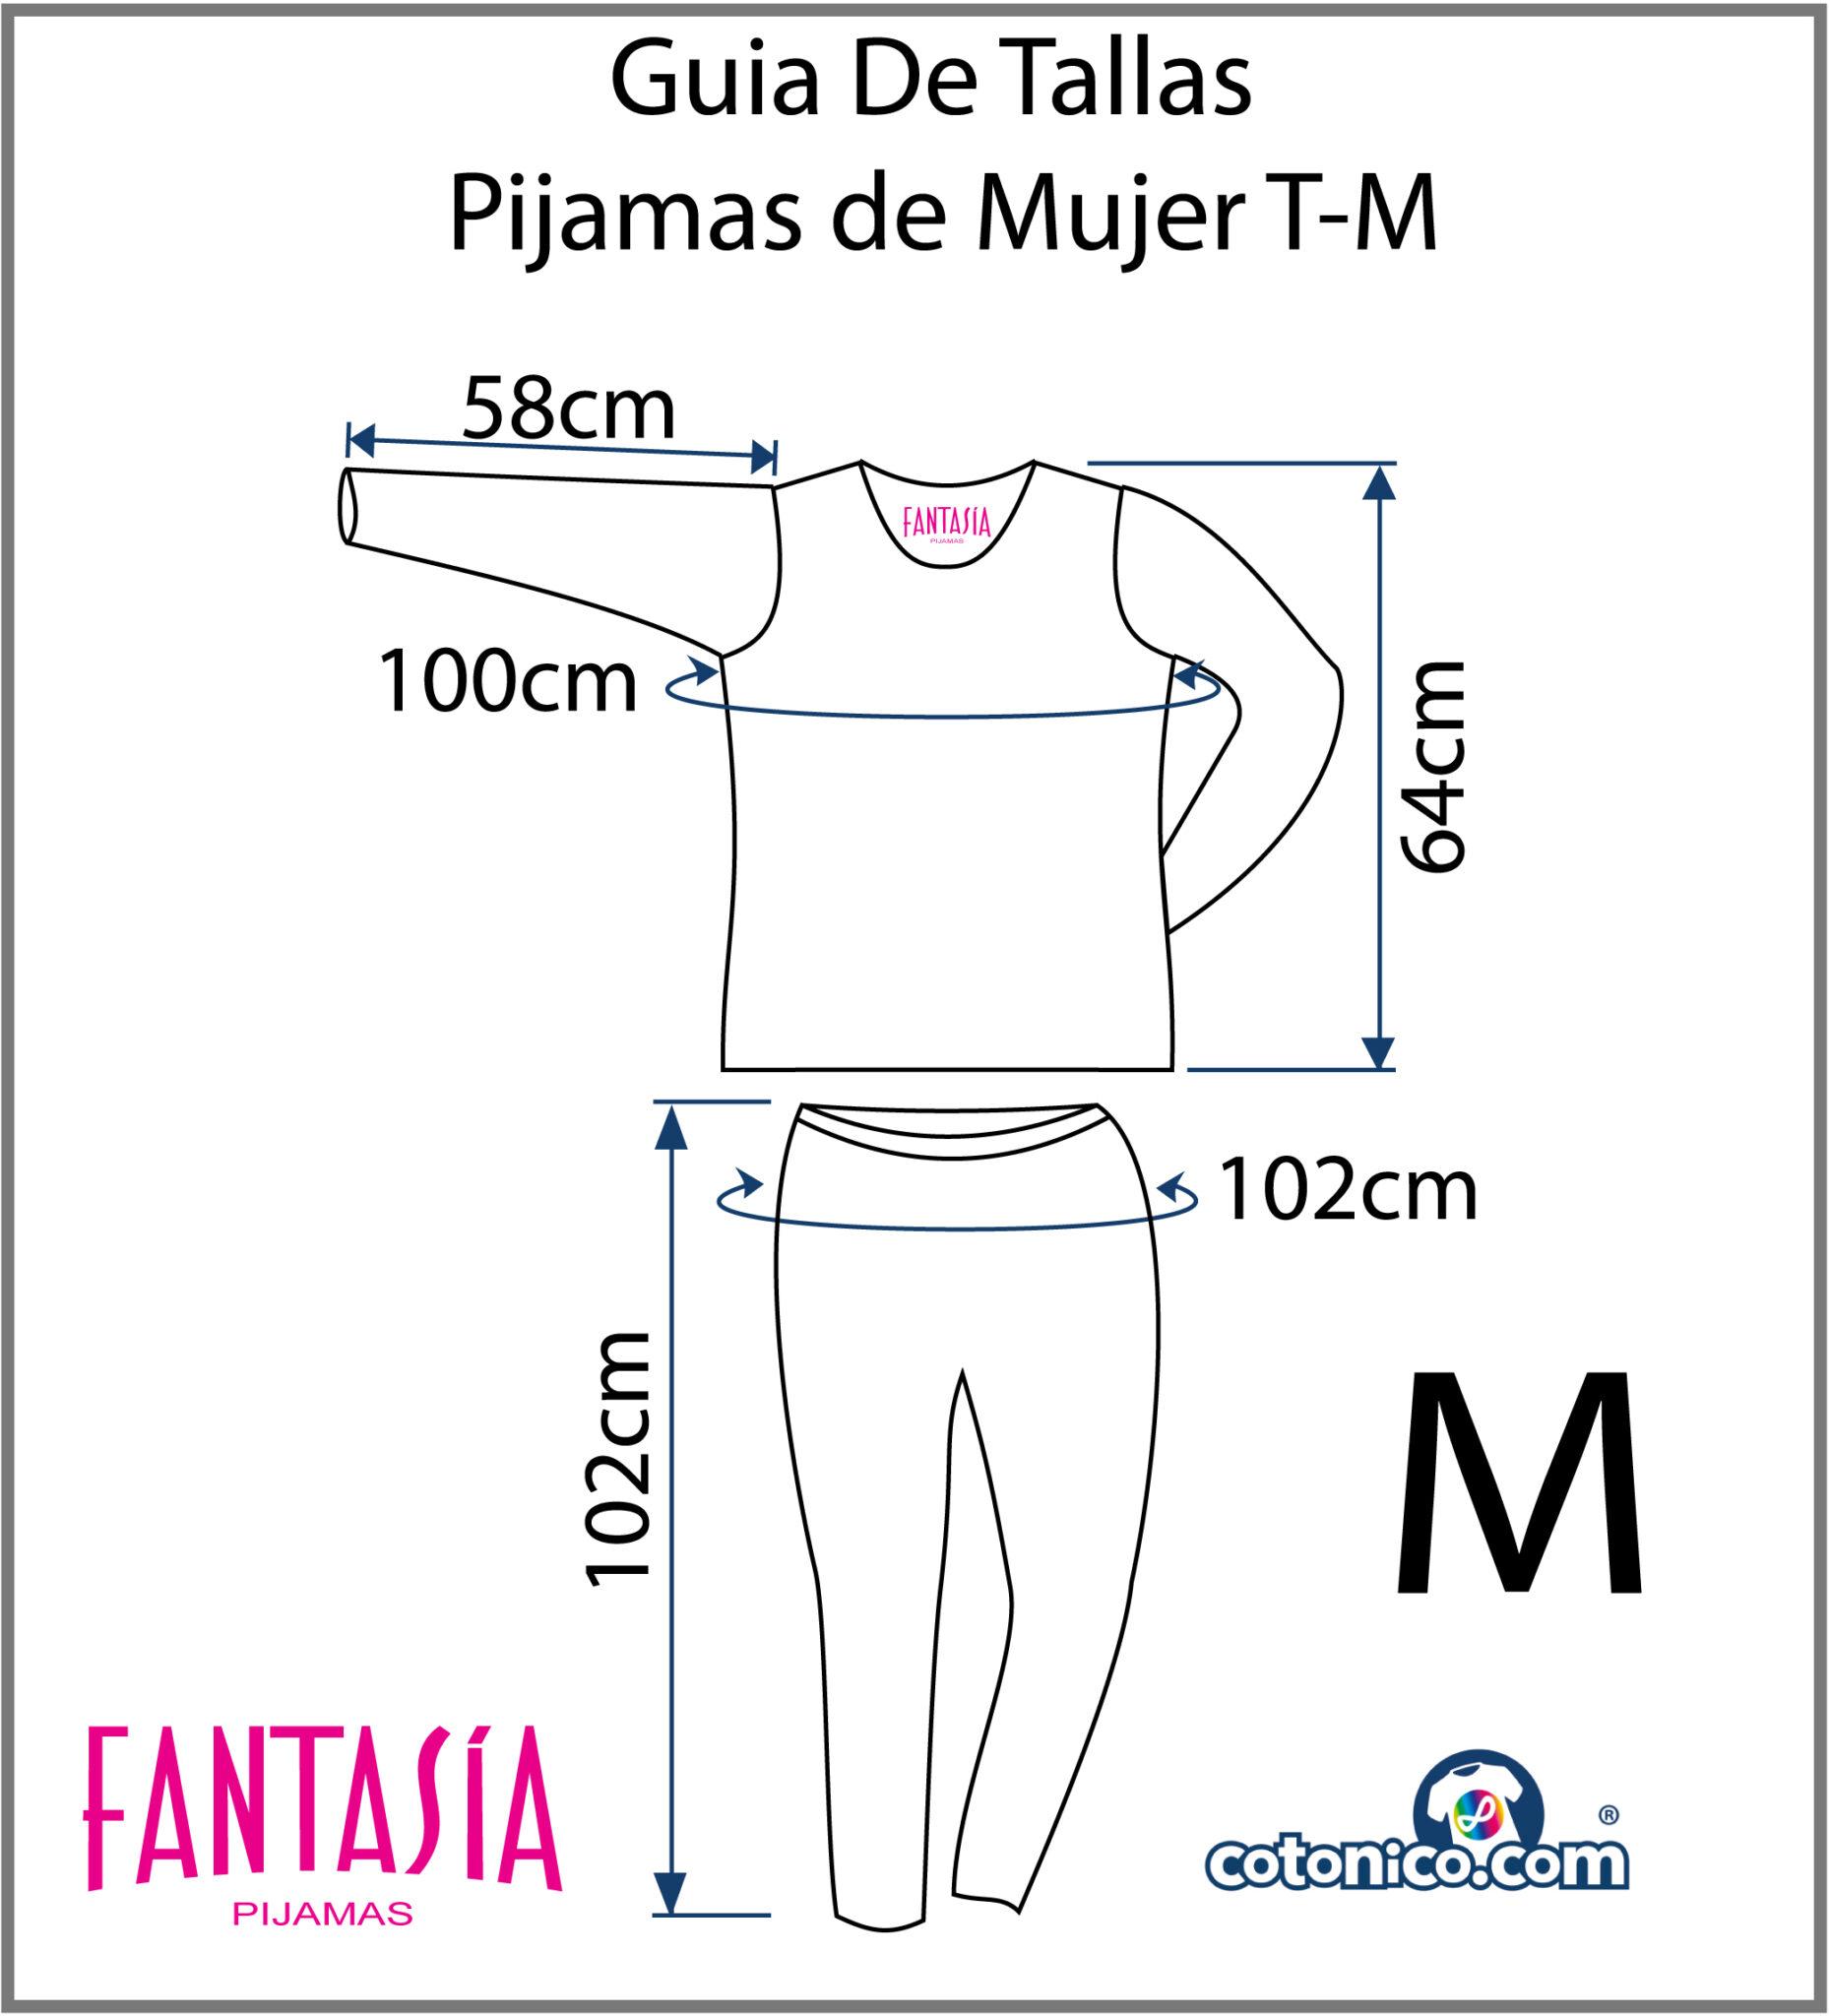 Guia-De-Tallas-Pijamas-De-Mujer-M